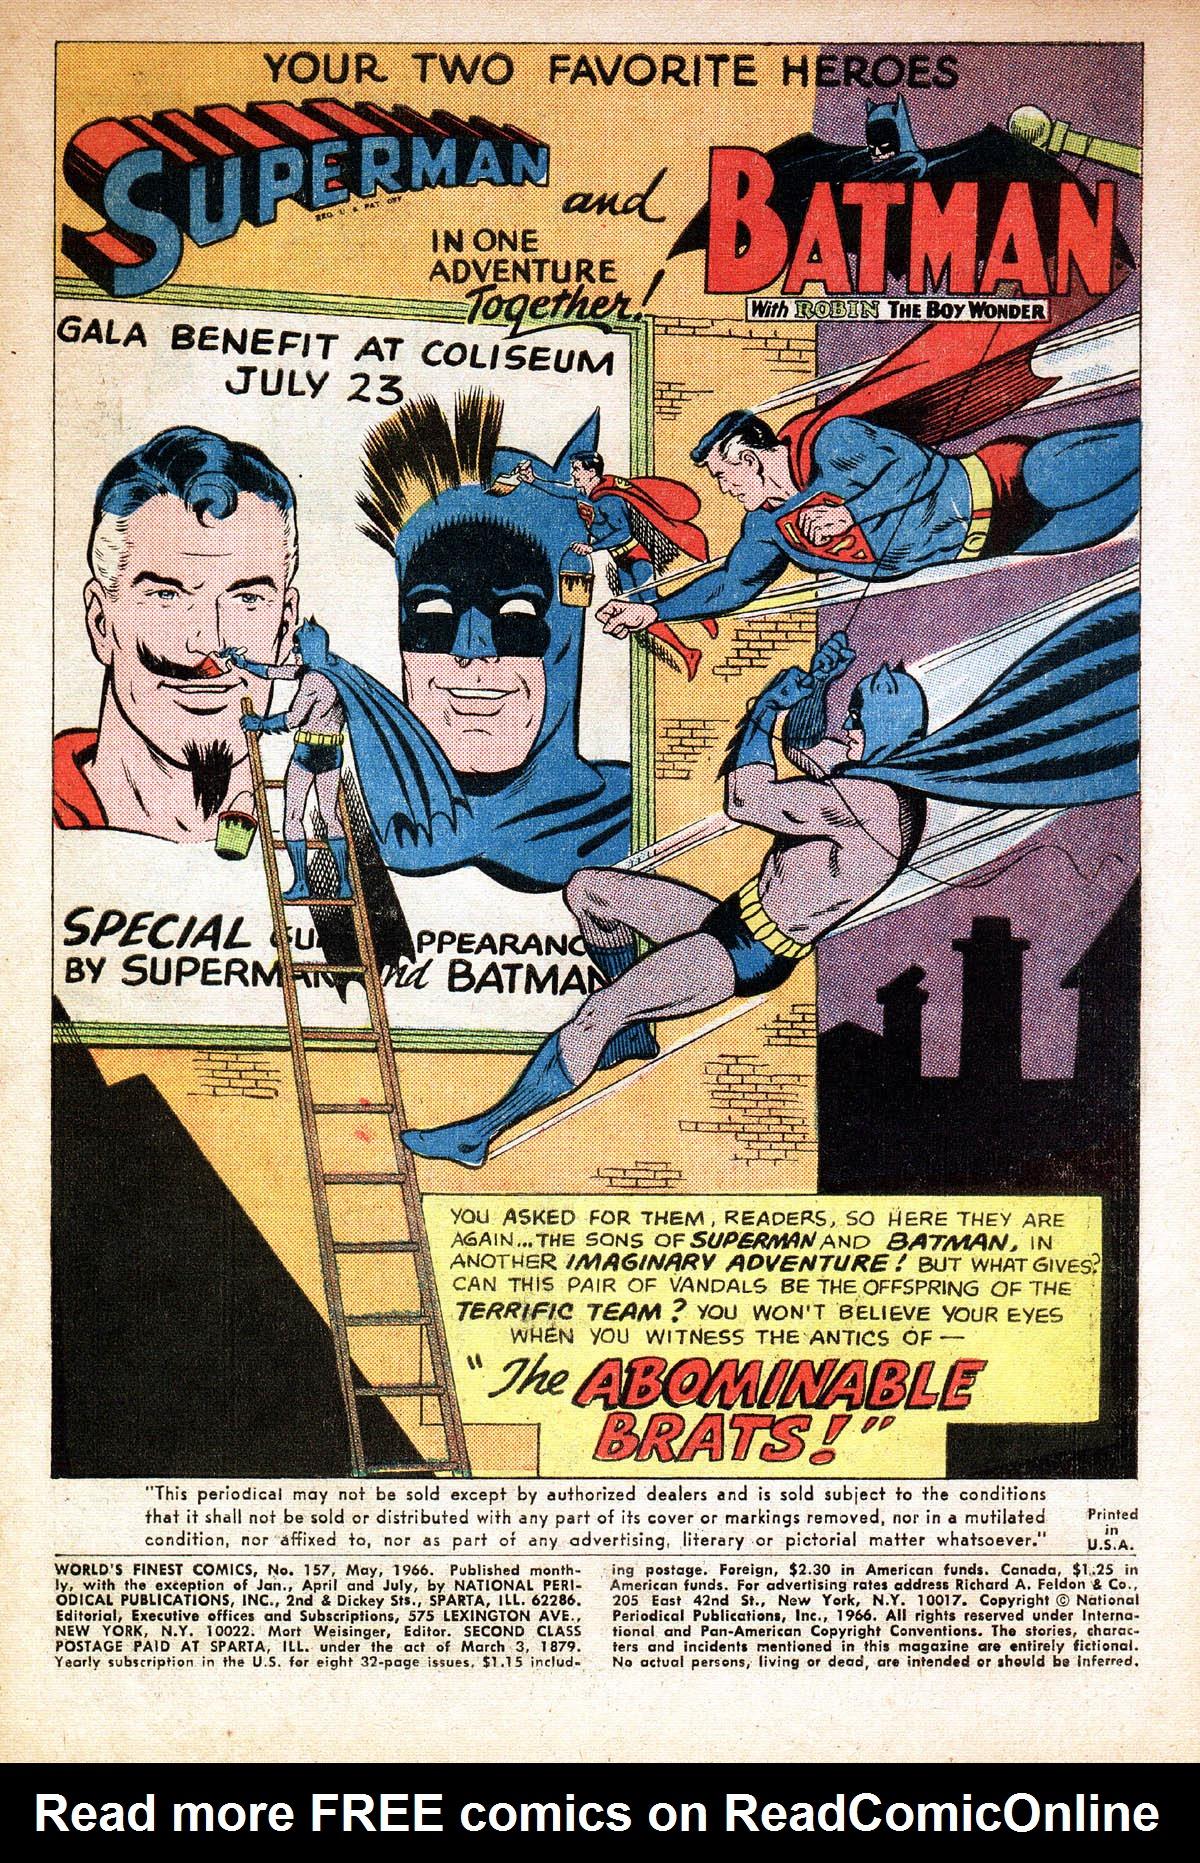 Read online World's Finest Comics comic -  Issue #157 - 3